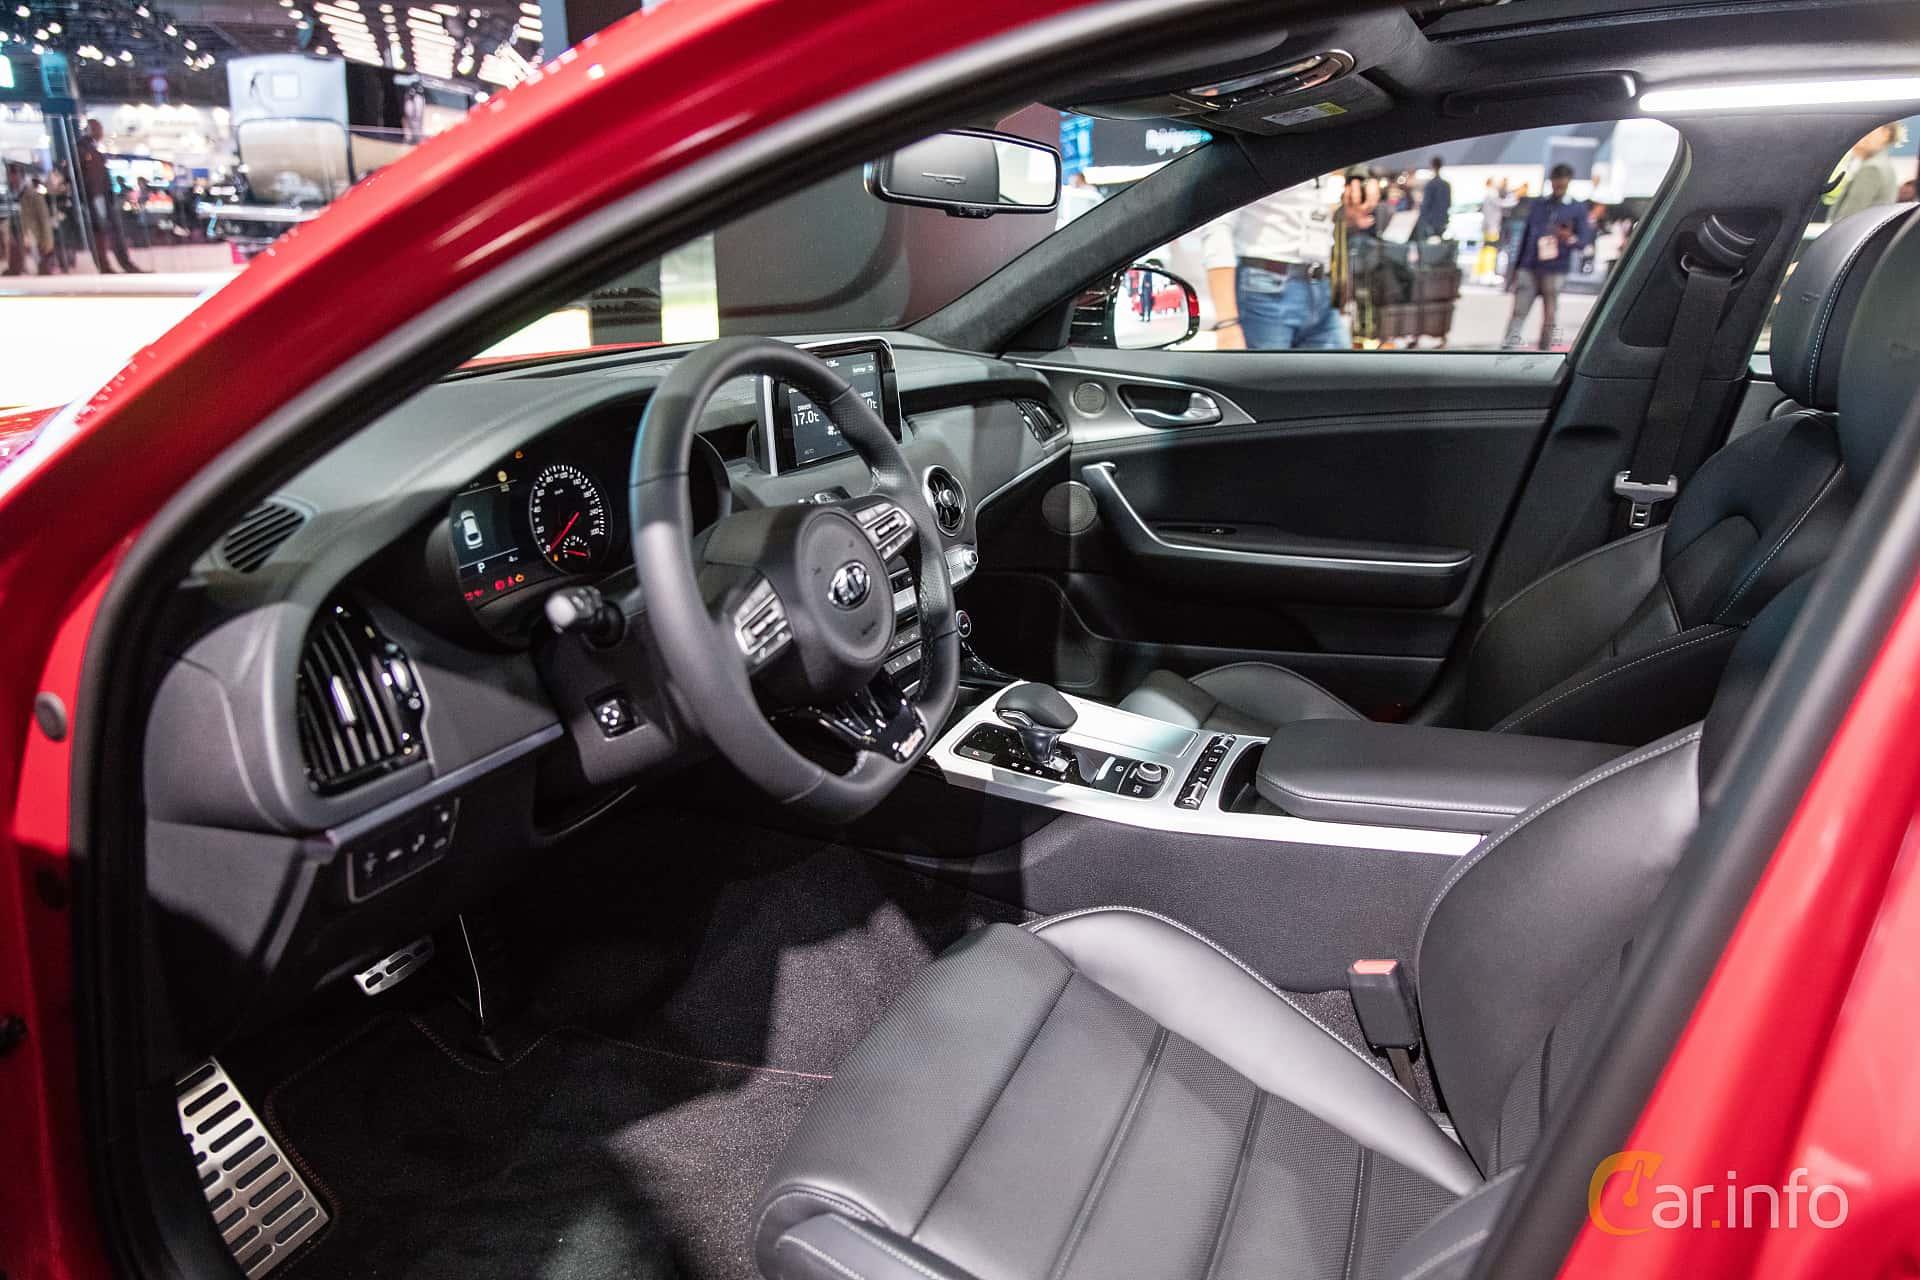 Interior of Kia Stinger GT 3.3 V6 T-GDI AWD Automatic, 370ps, 2019 at Paris Motor Show 2018